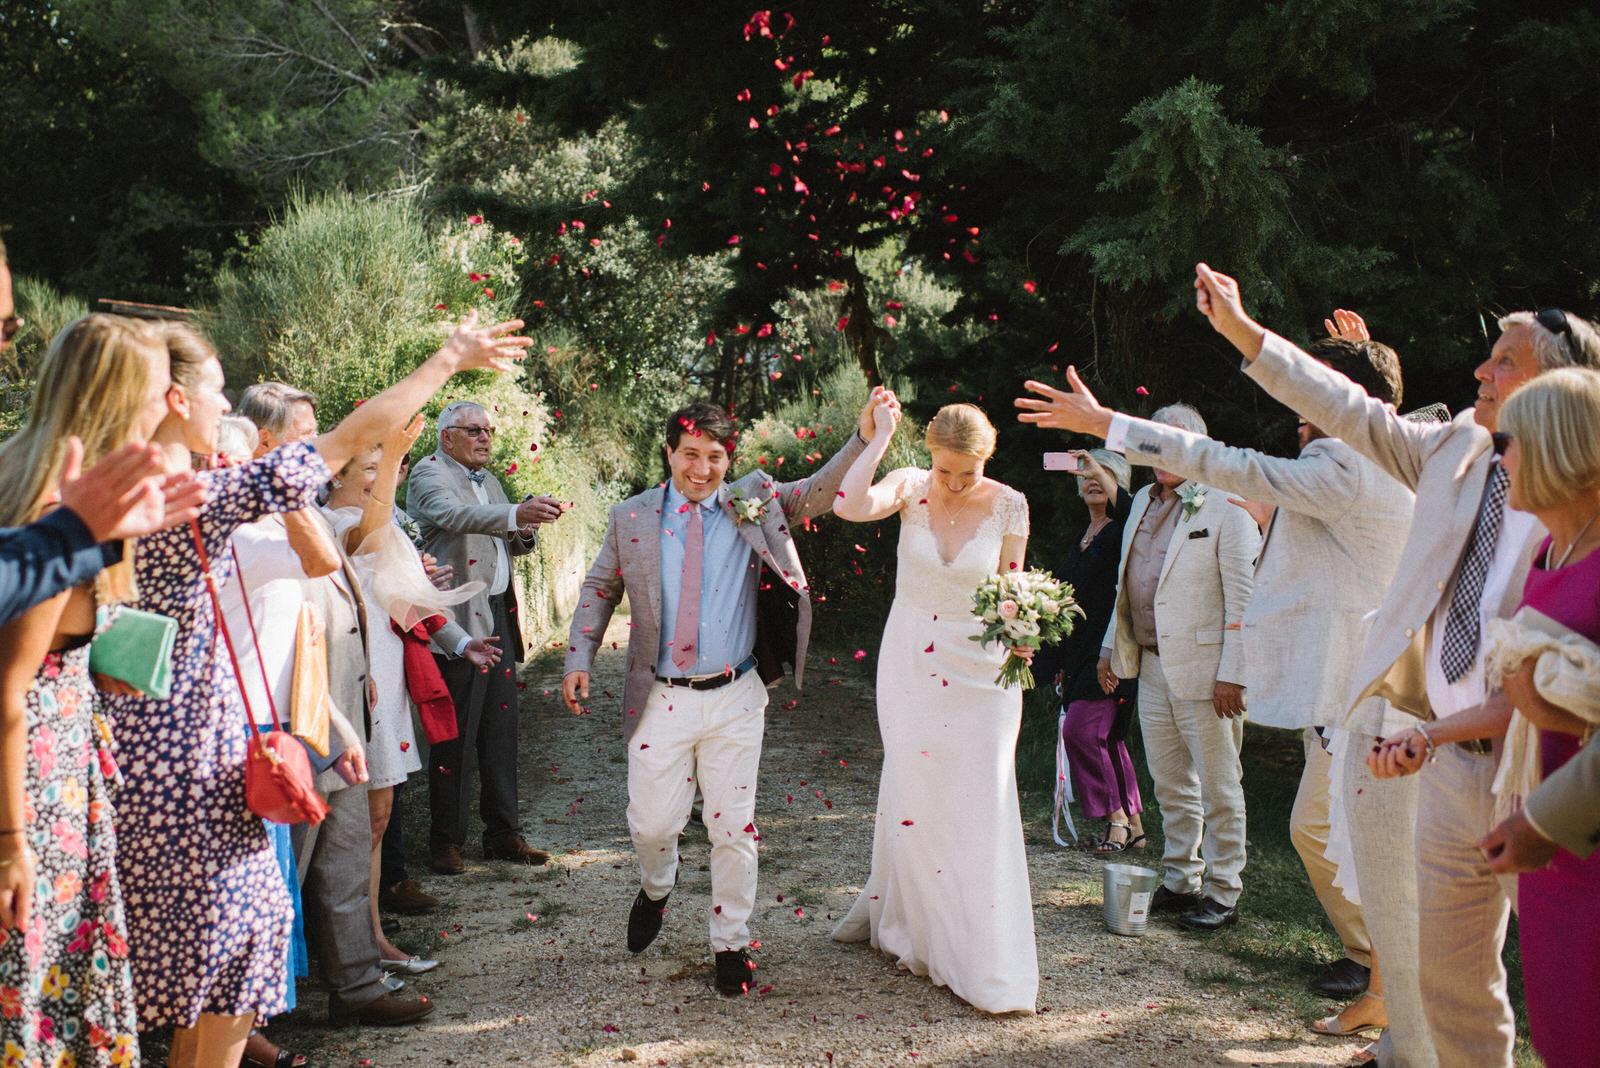 019-LOURMARIN-WEDDING-PHOTOGRAPHER-PROVENCE-WEDDING-ALTERNATIVE-WEDDING-PHOTOGRAPHY-FRANCE-PROVENCE-GARDEN-WEDDING.JPG